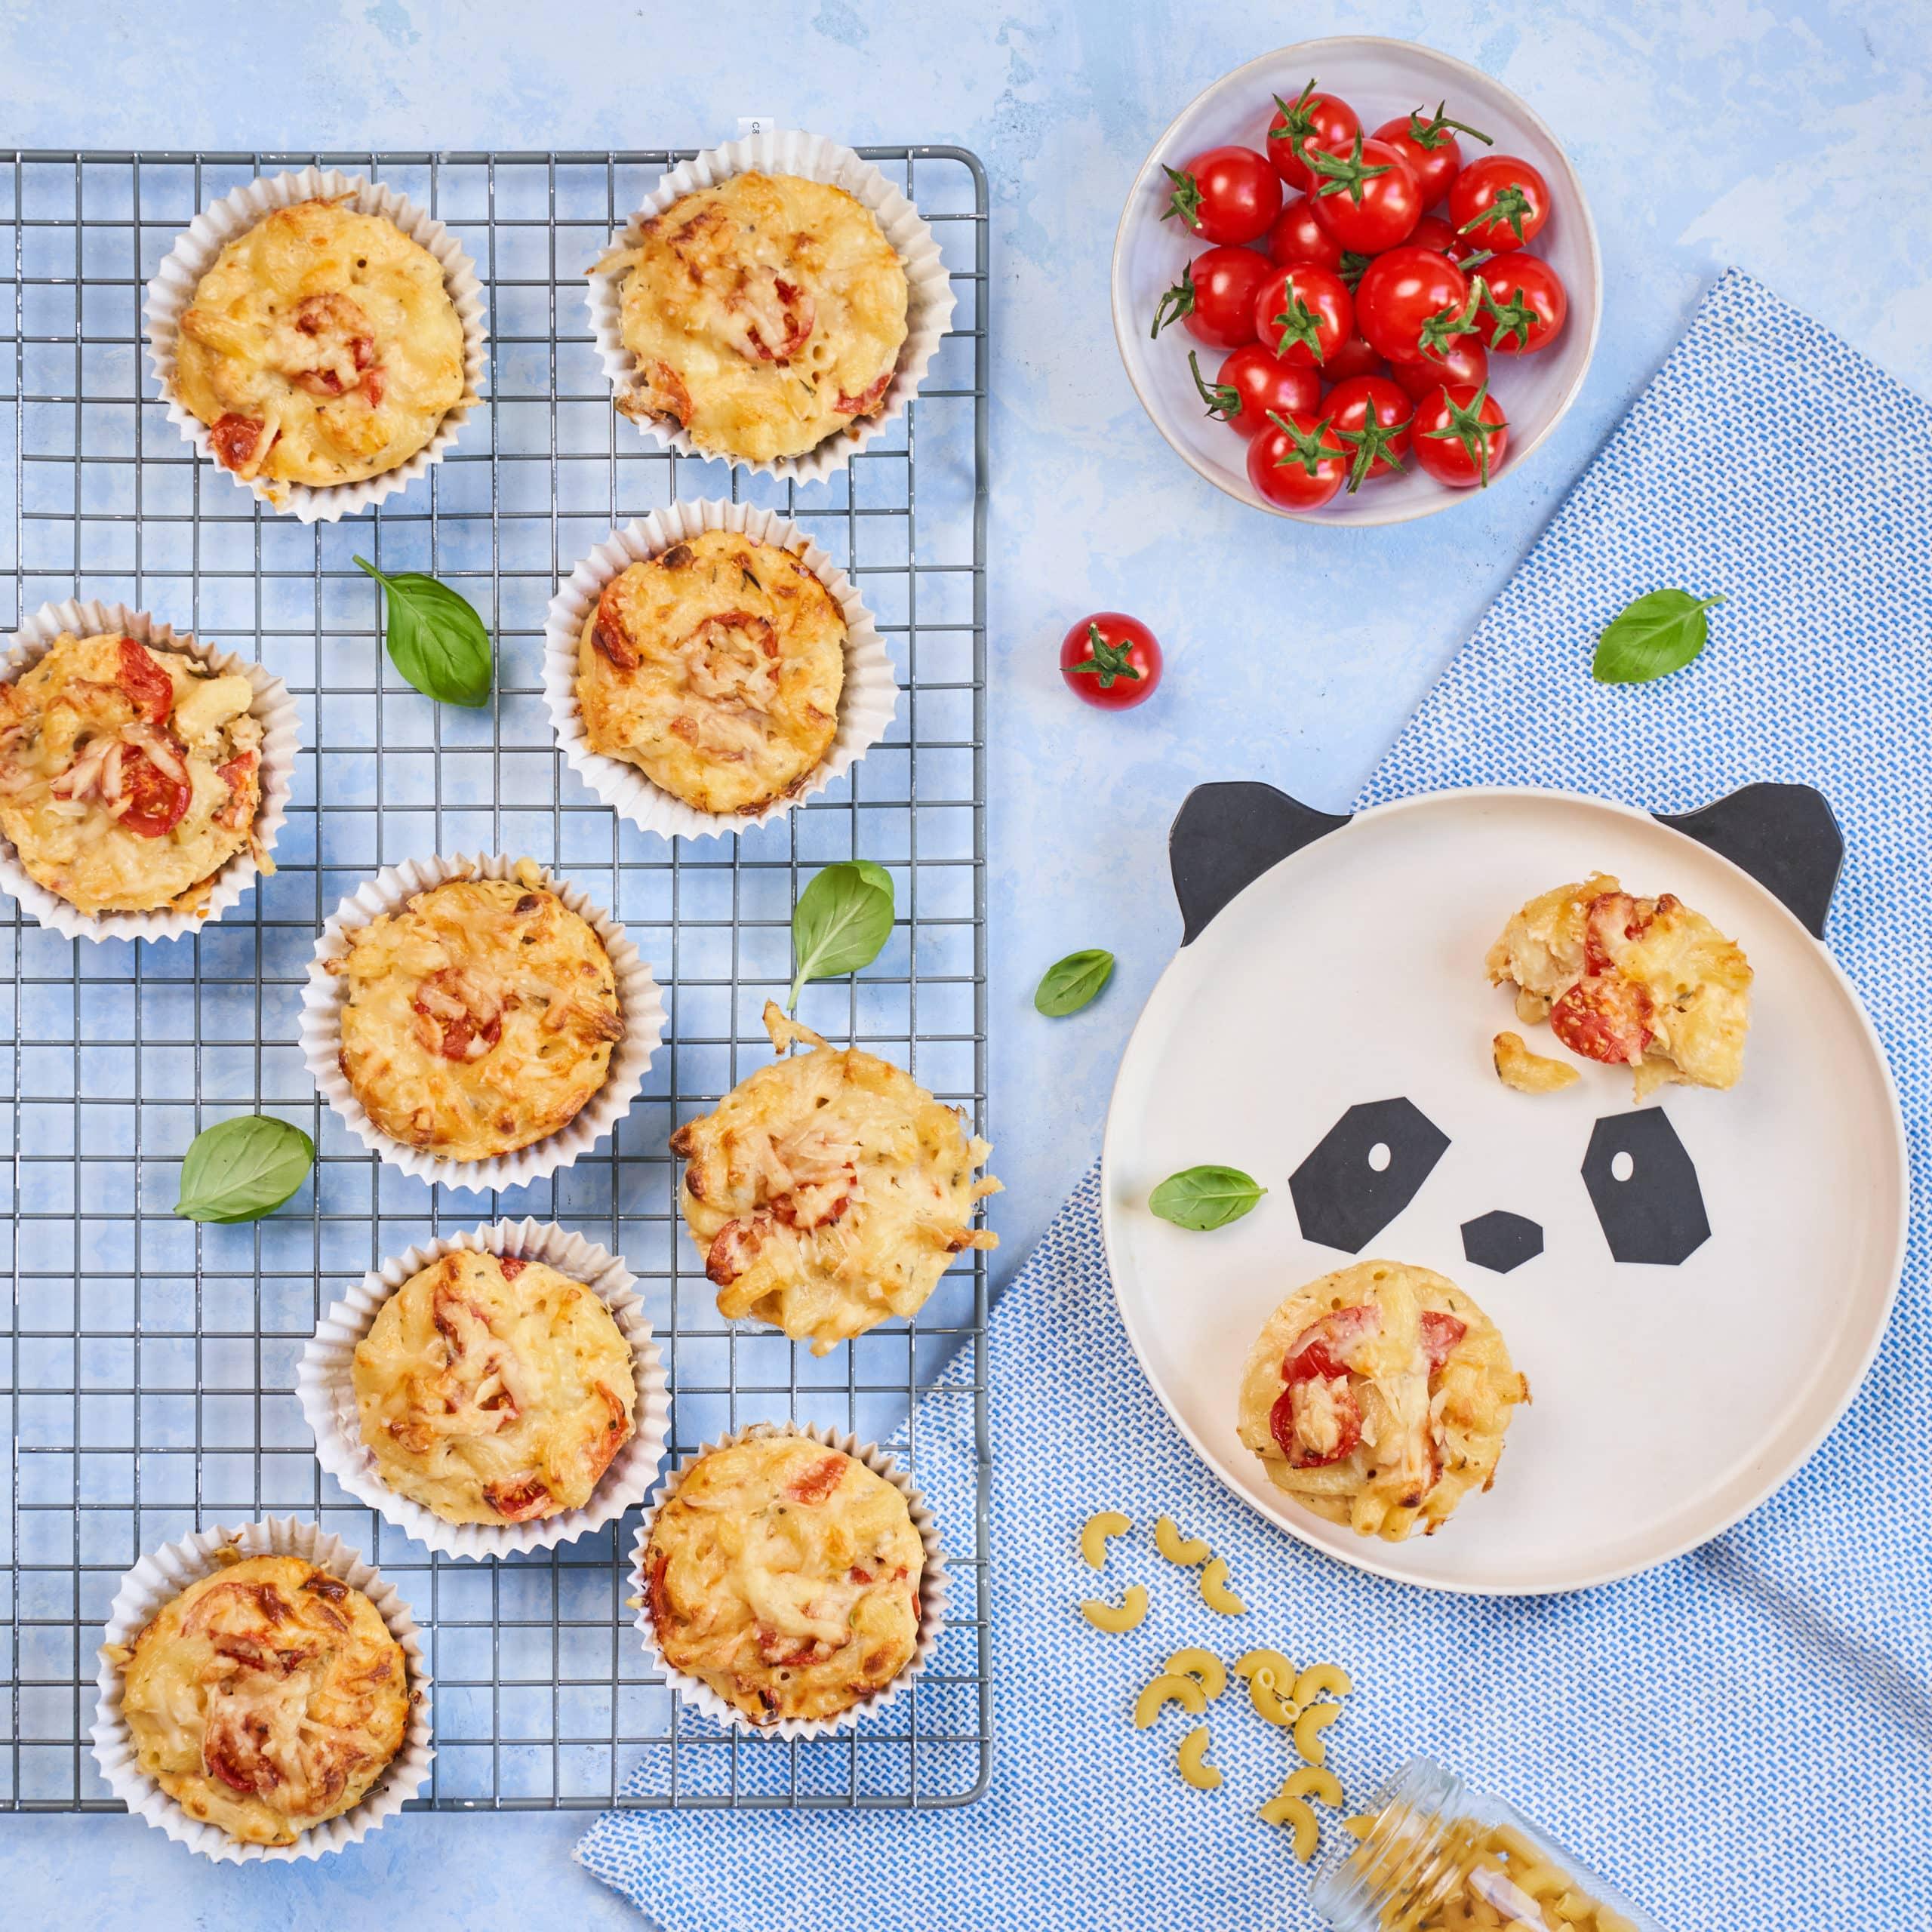 Macaroni & Cheese Bites recipe by Annabel Karmel